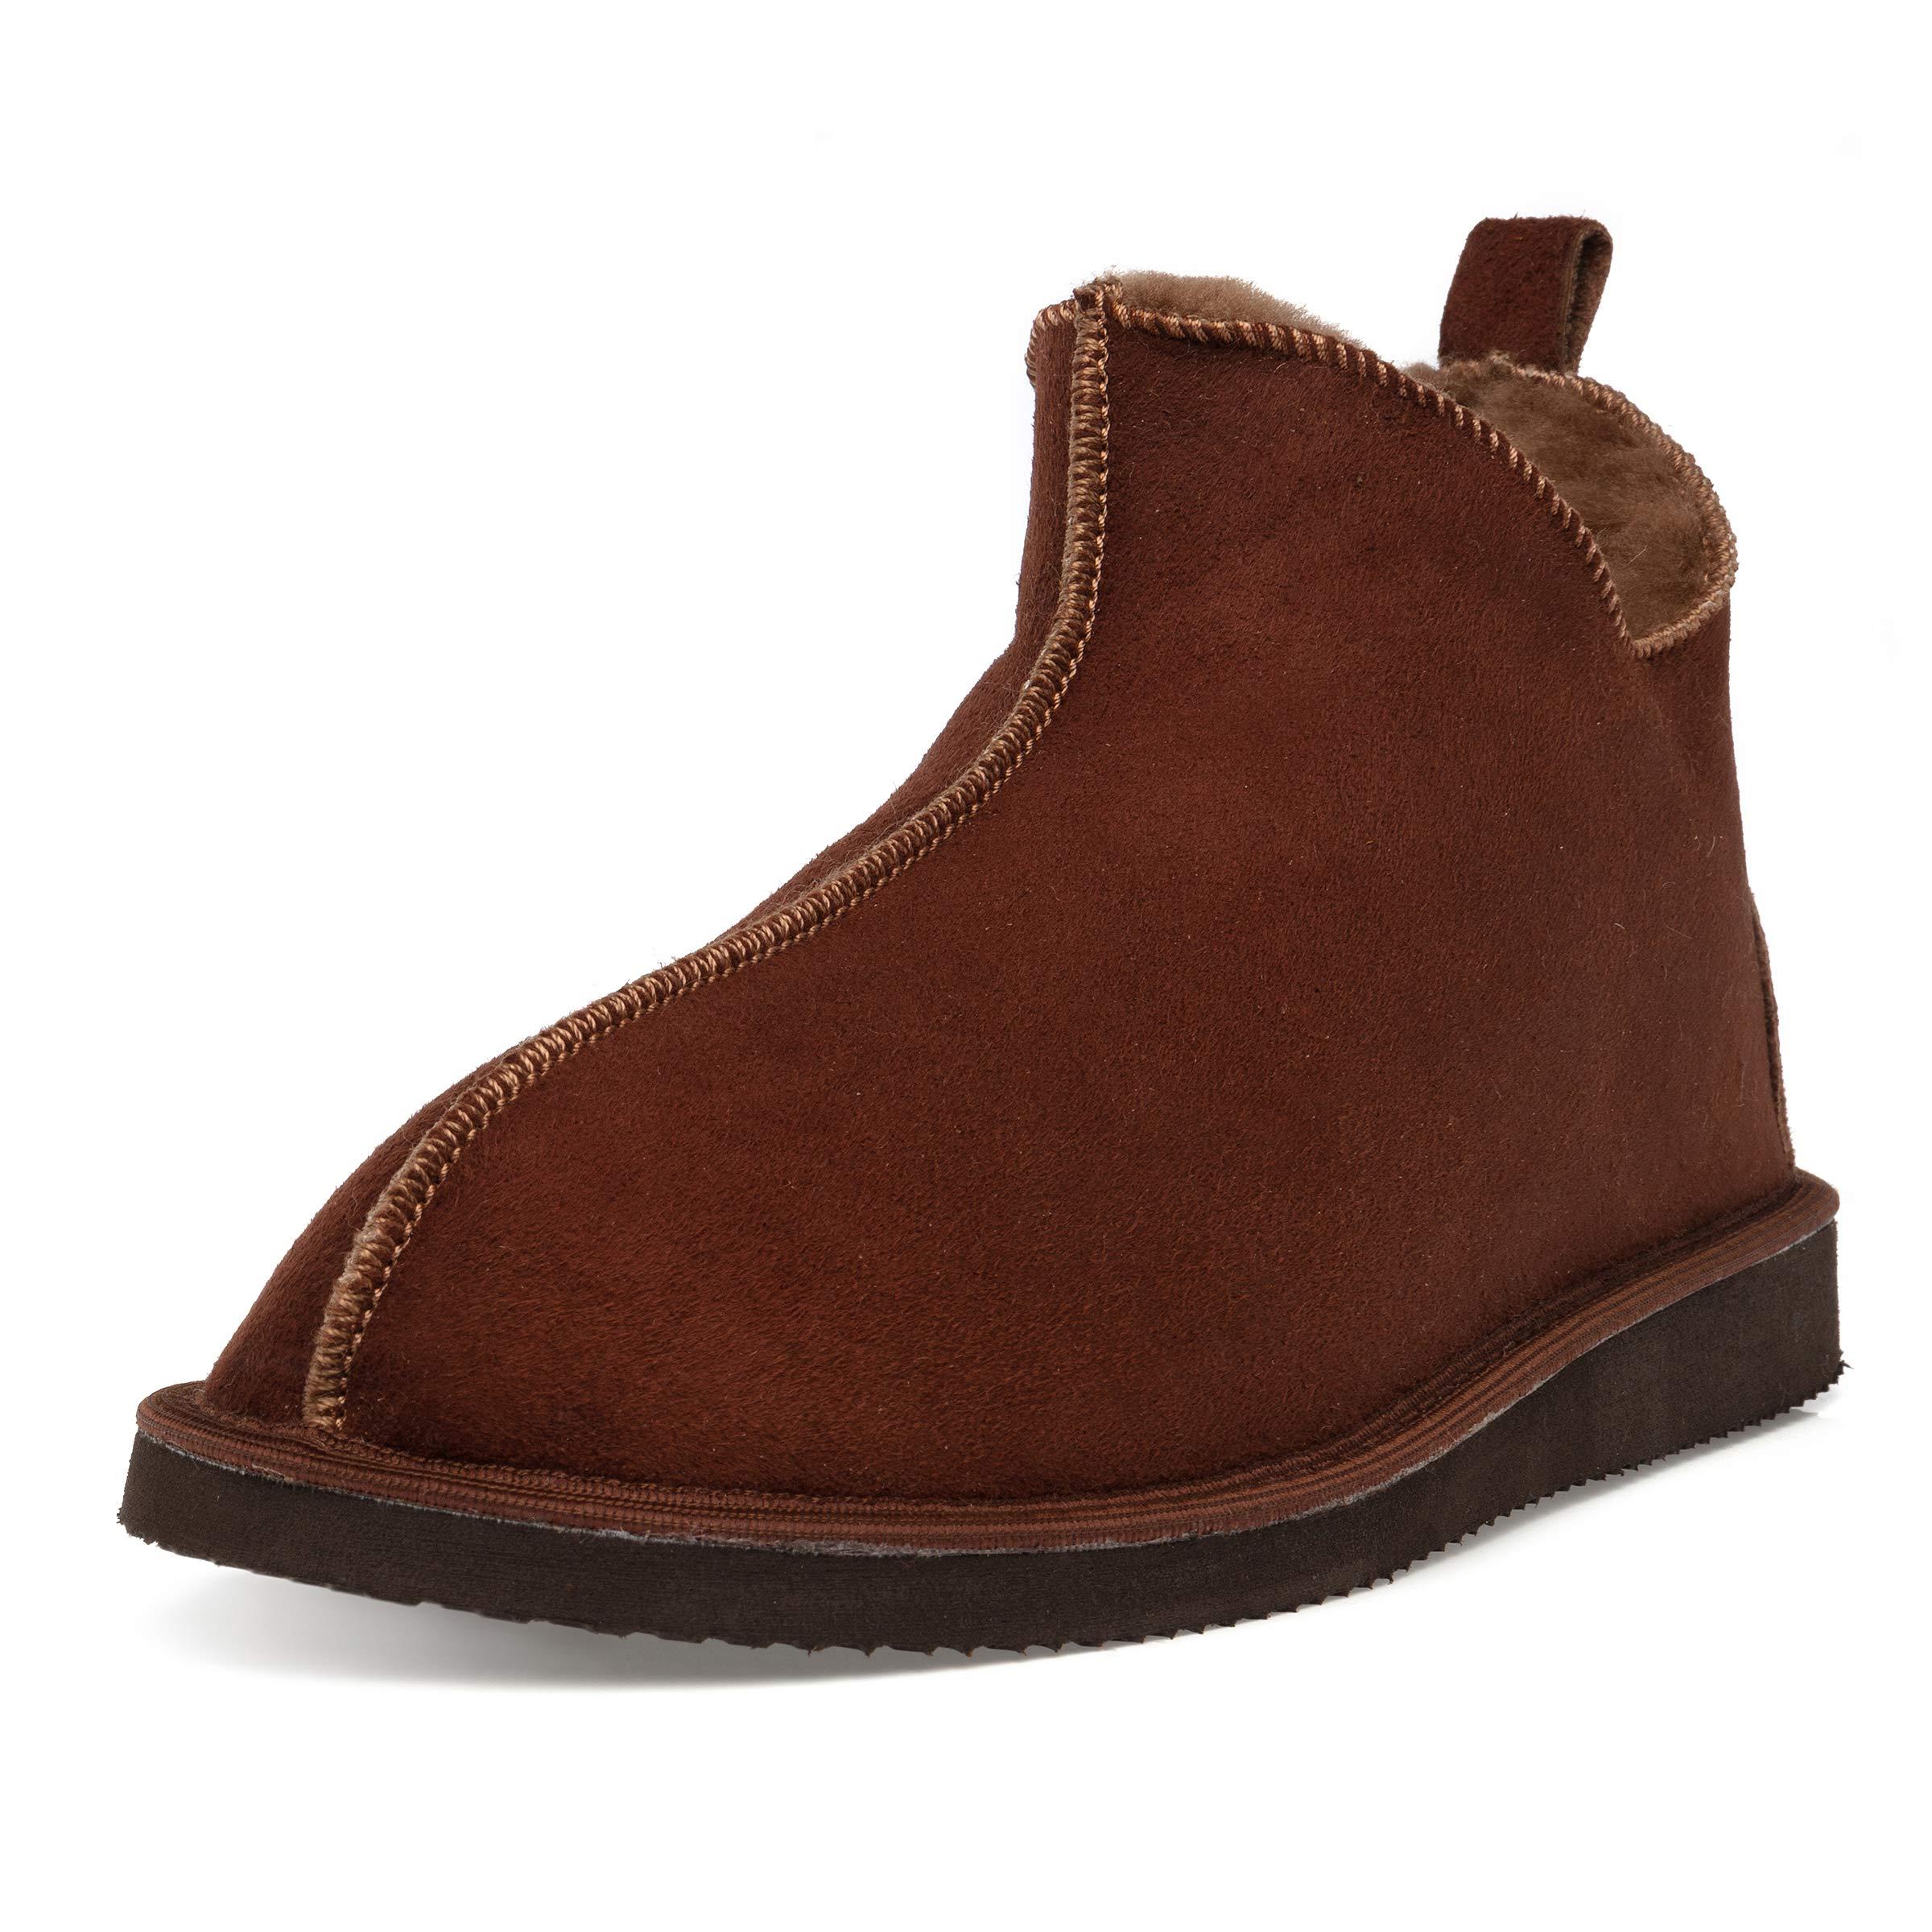 Ciora Women s Luxury Handmade Genuine 100% Sheepskin Ankle Boot Slippers  (Non-Slip Sole 82d11a6440a8